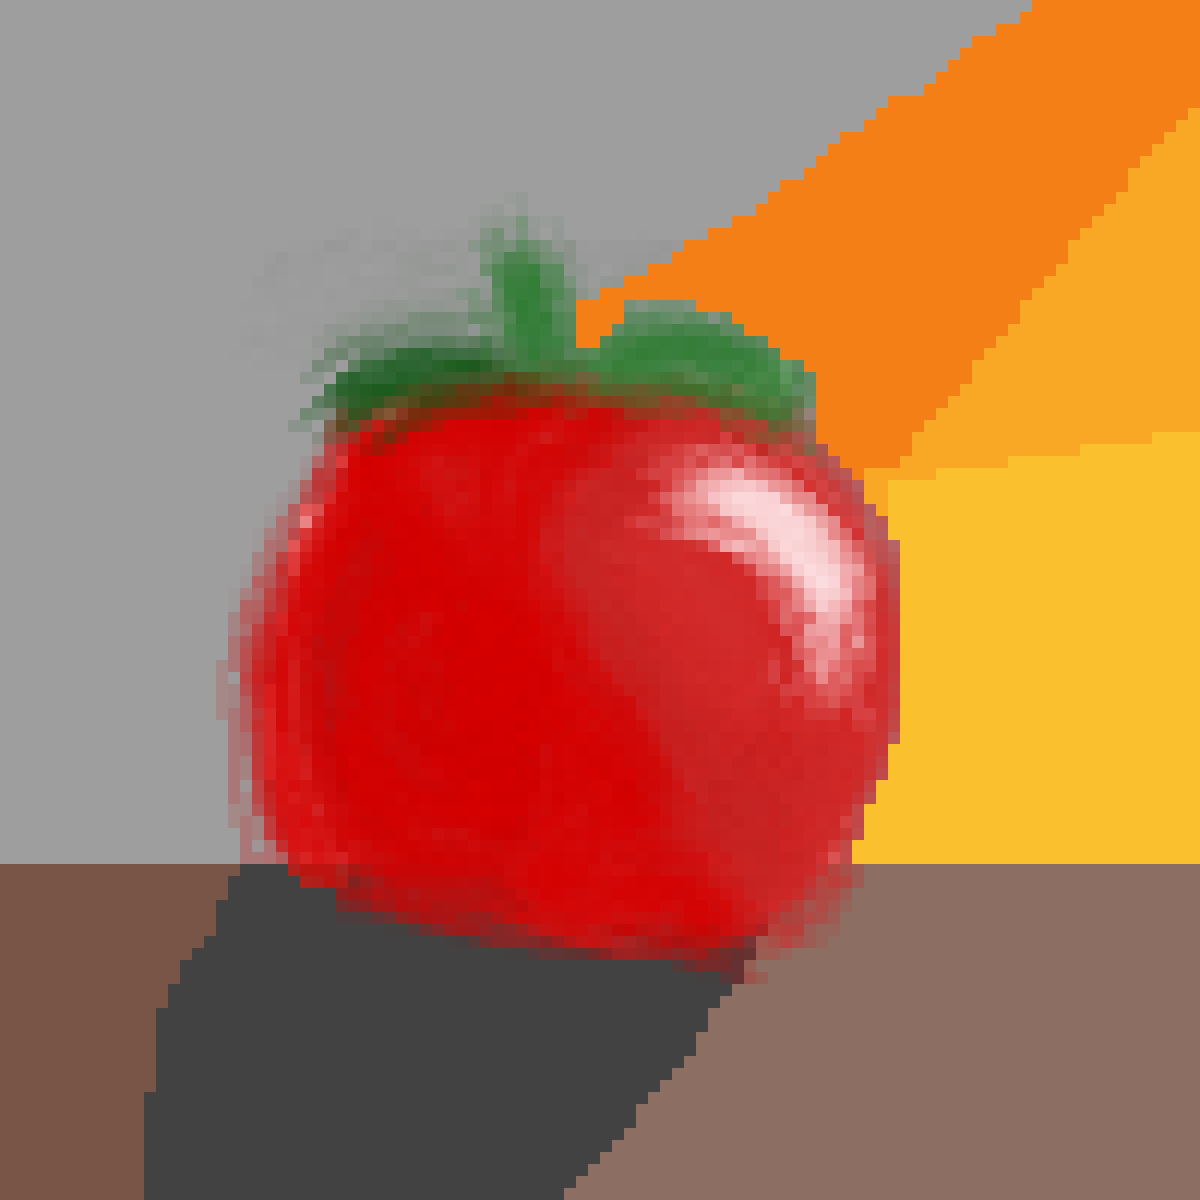 Sunny Tomato by Bellablossom06